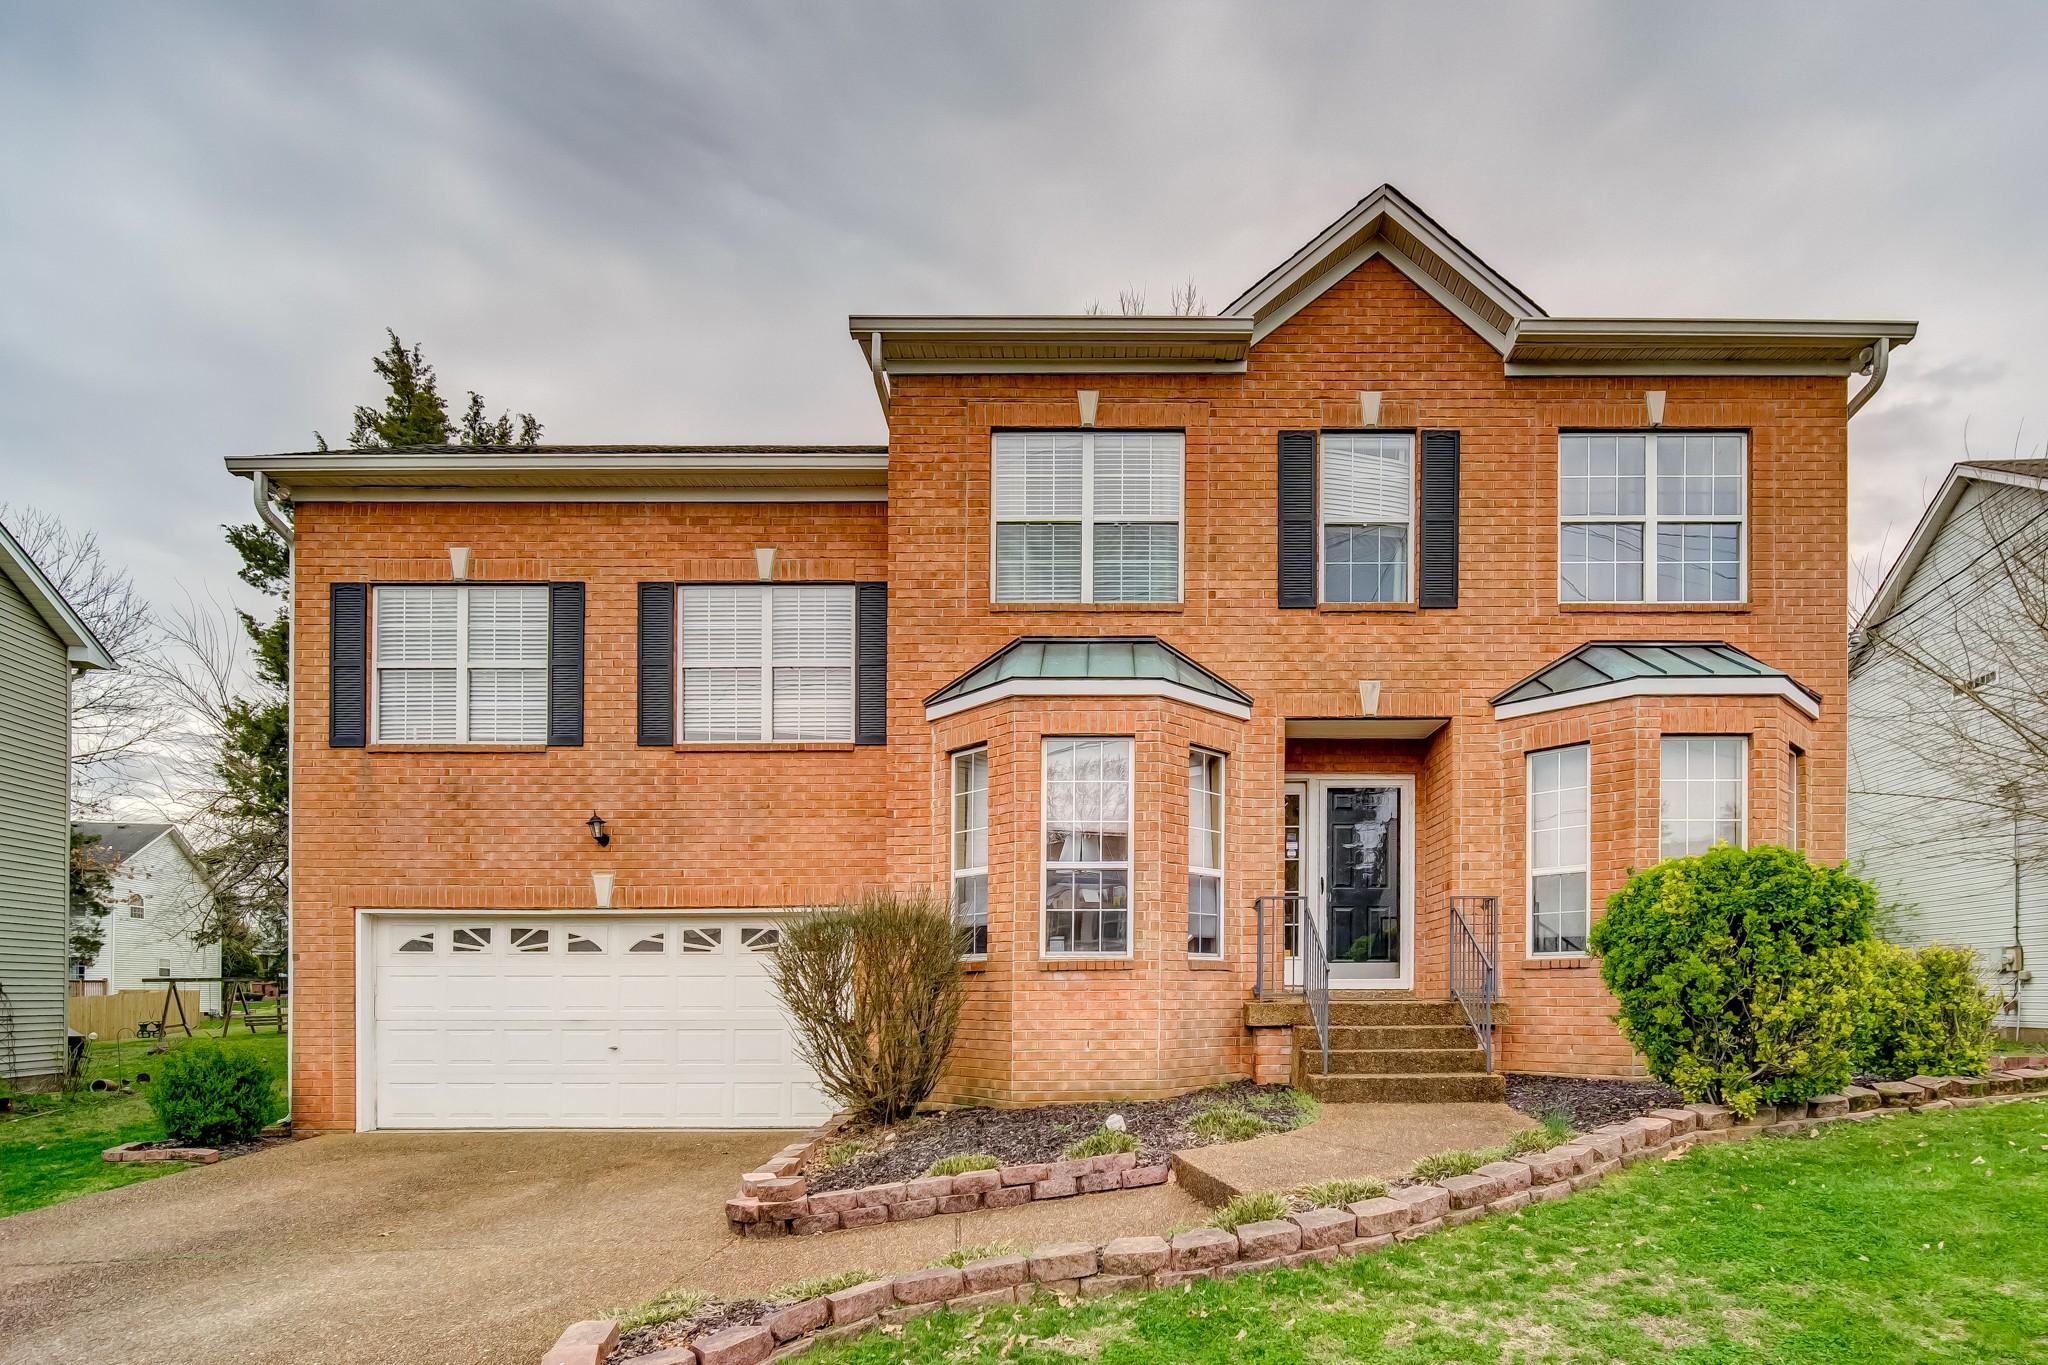 105 Brunswick Dr Property Photo - Hendersonville, TN real estate listing